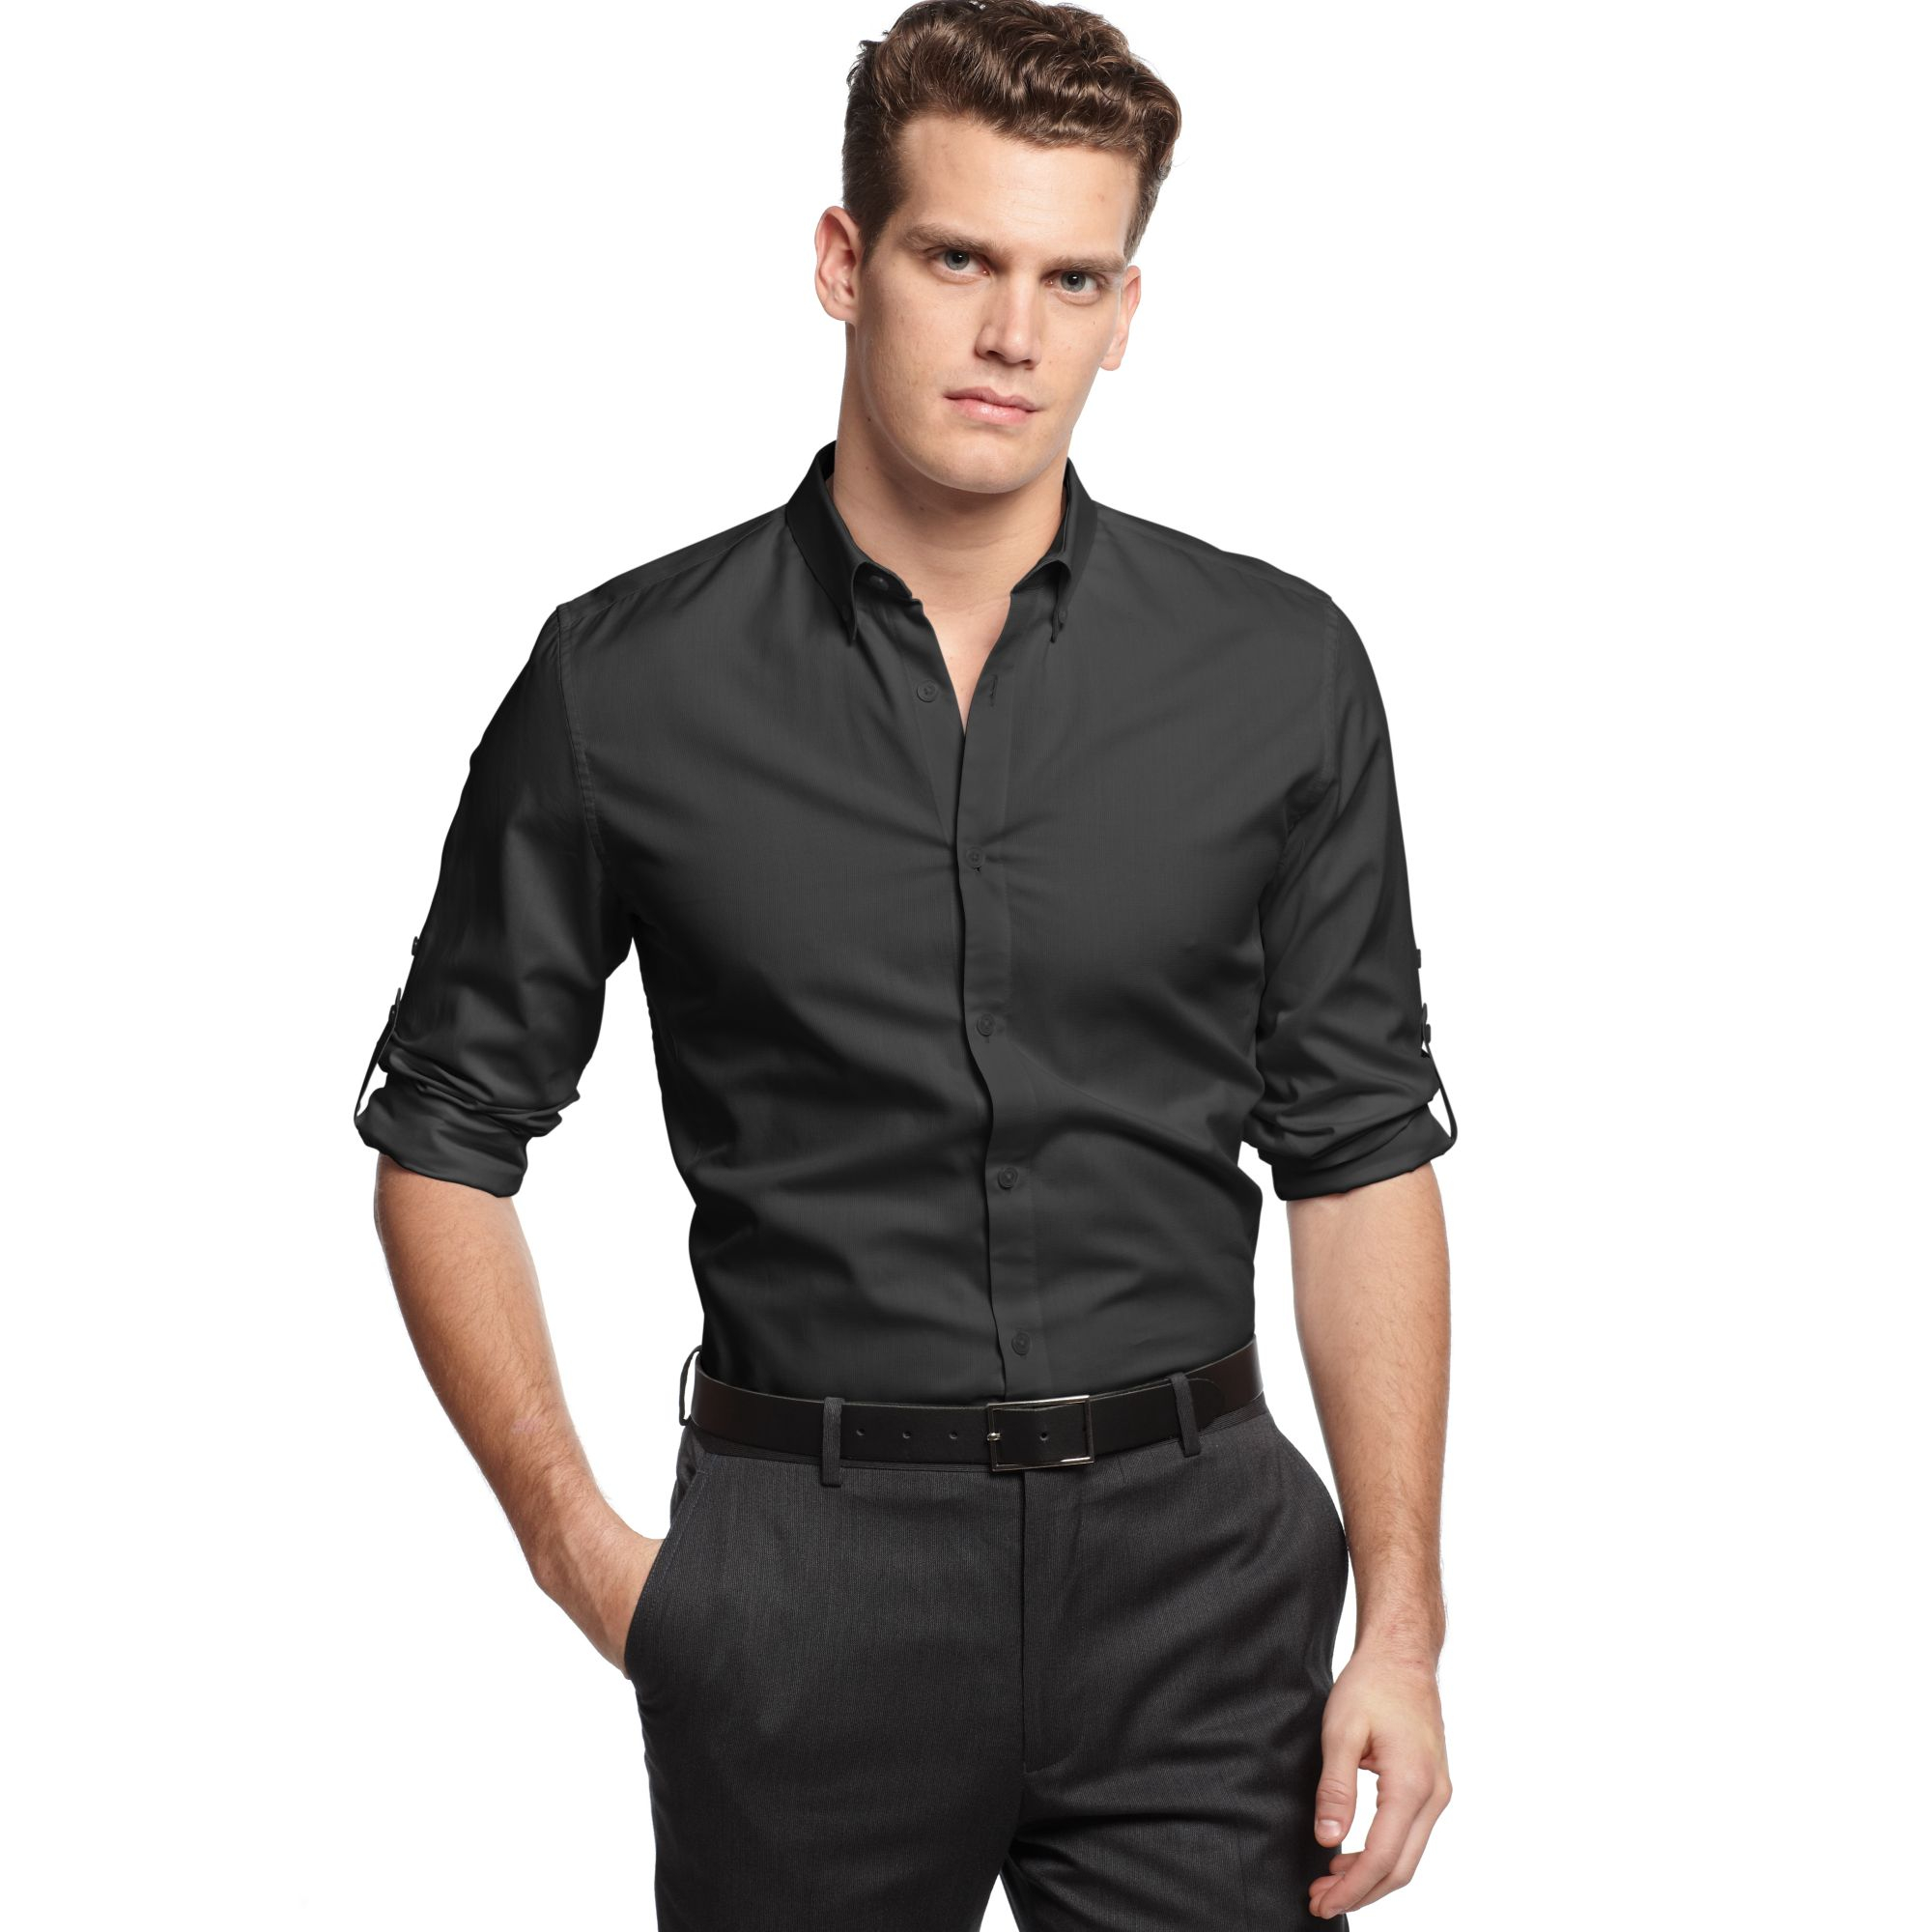 2ecb82eef3d Lyst - Calvin Klein Micro Dobby Slim Fit Shirt in Black for Men